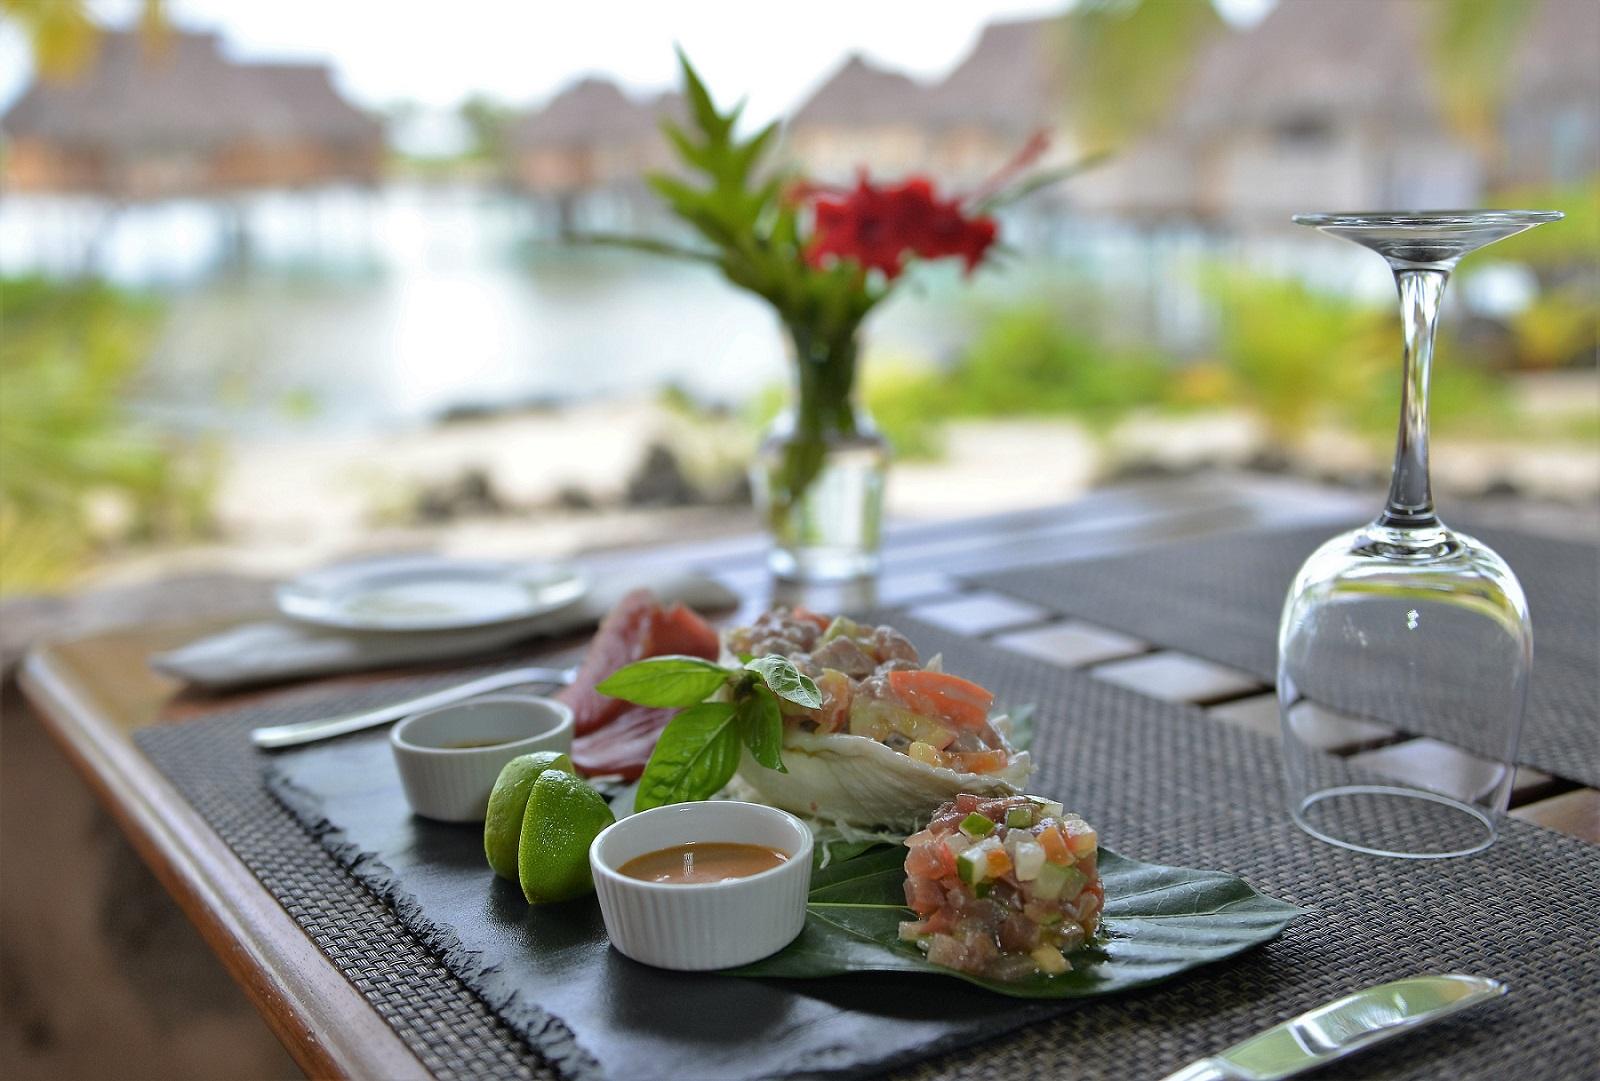 https://tahititourisme.com.au/wp-content/uploads/2021/10/TPBR-buffet-breakfast-®-M.Colombini-5-instagram-Copie.jpg